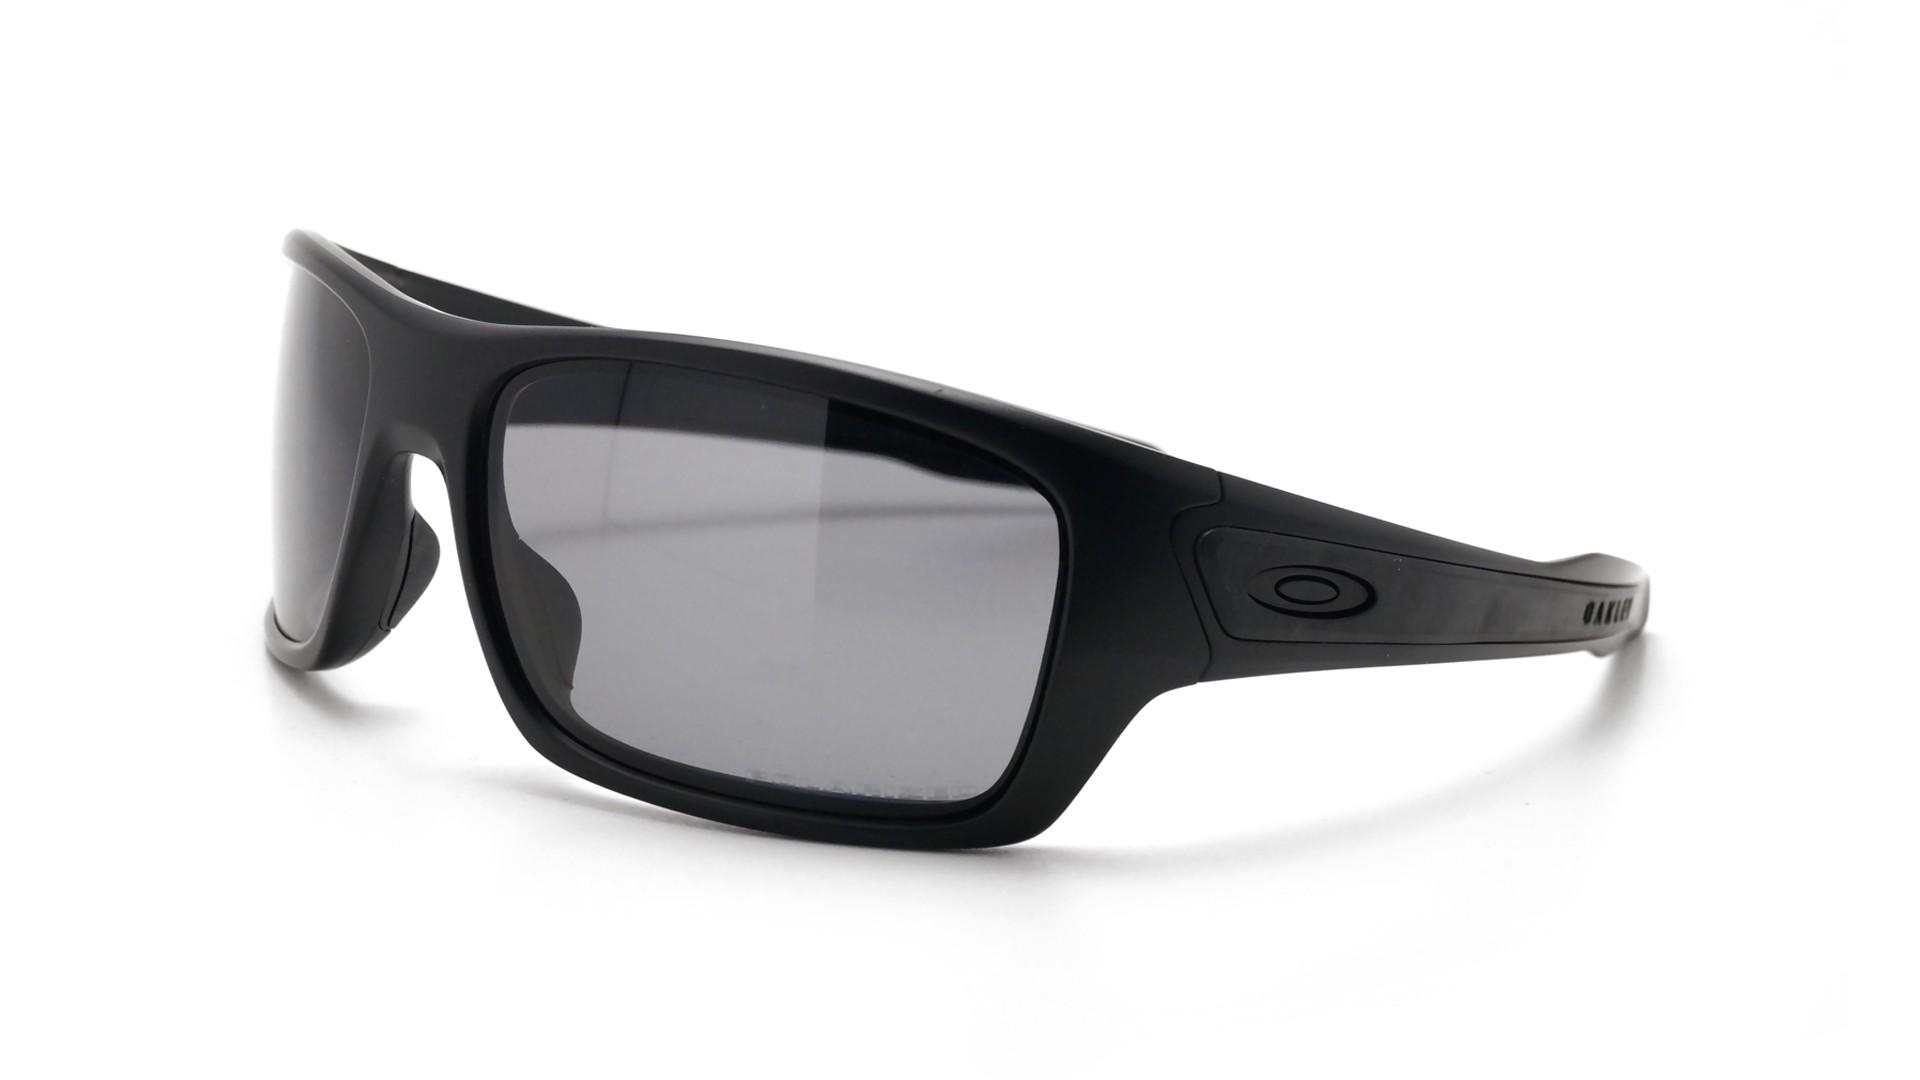 345c5cc03c Sunglasses Oakley Turbine Matte Black OO9263 07 65-17 Large Polarized